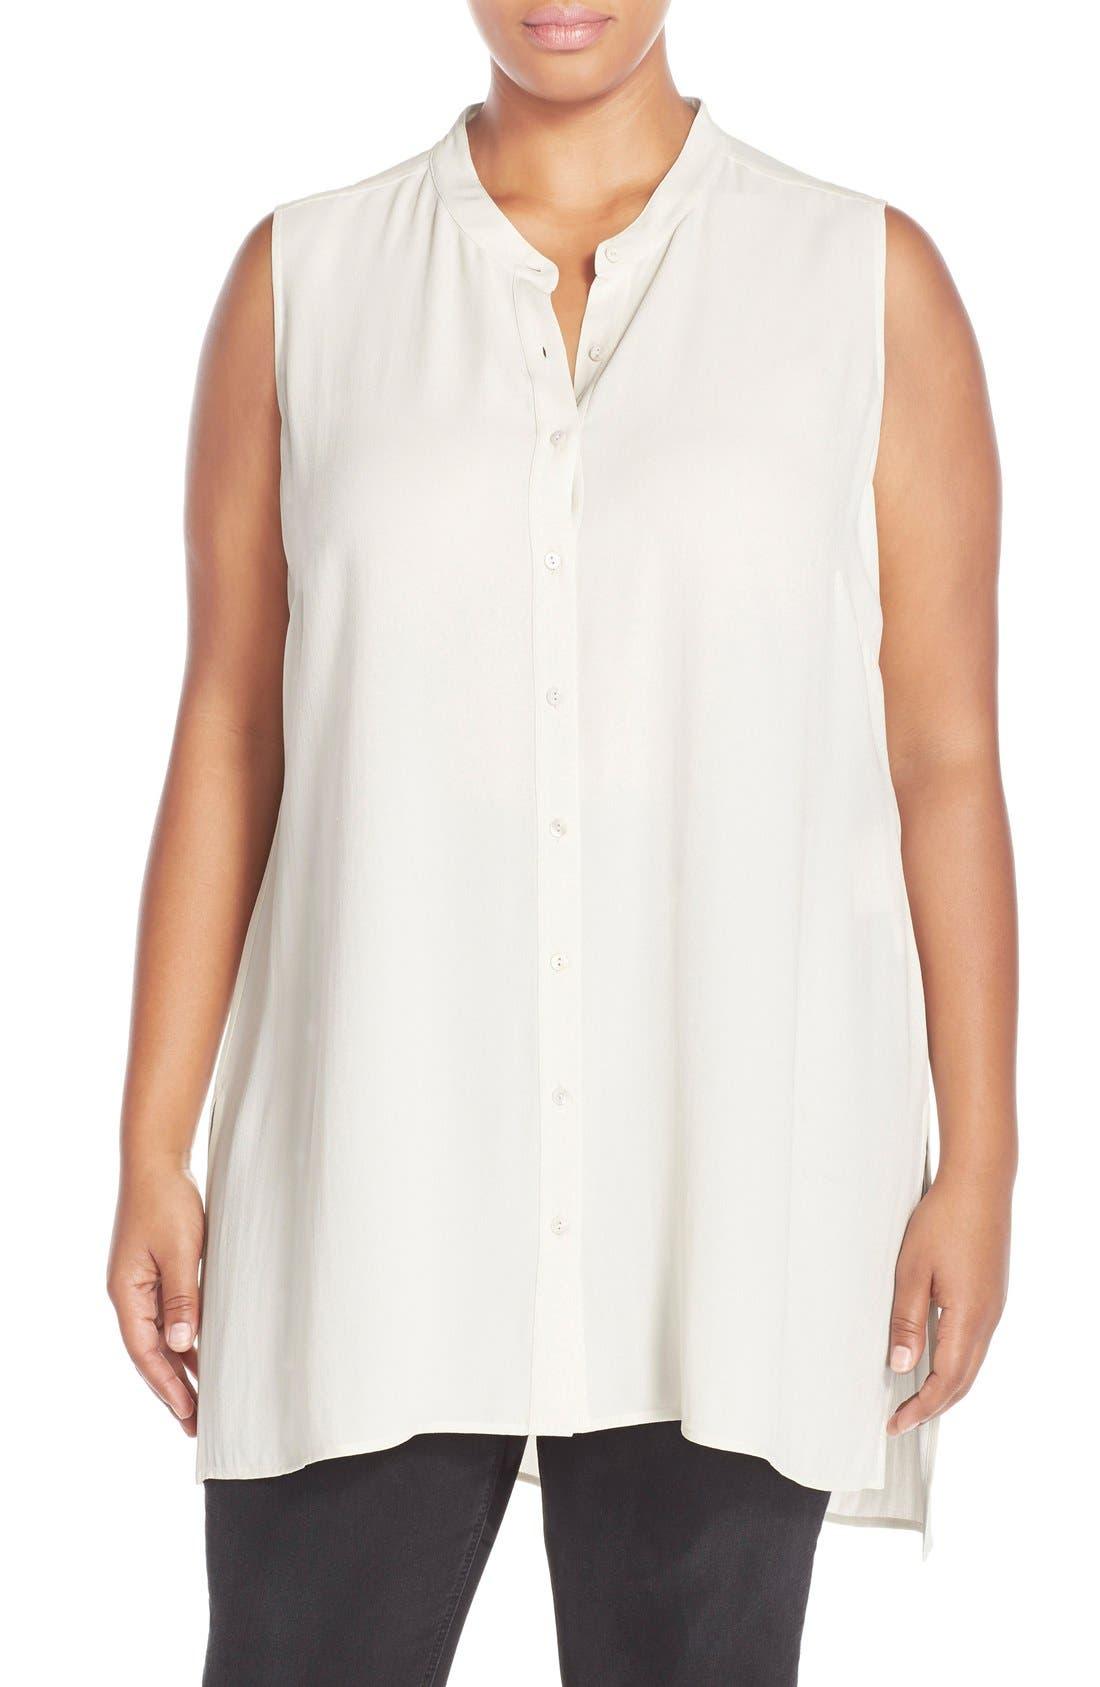 Alternate Image 1 Selected - Eileen Fisher Mandarin Collar Silk Crepe Tunic Shirt (Plus Size)